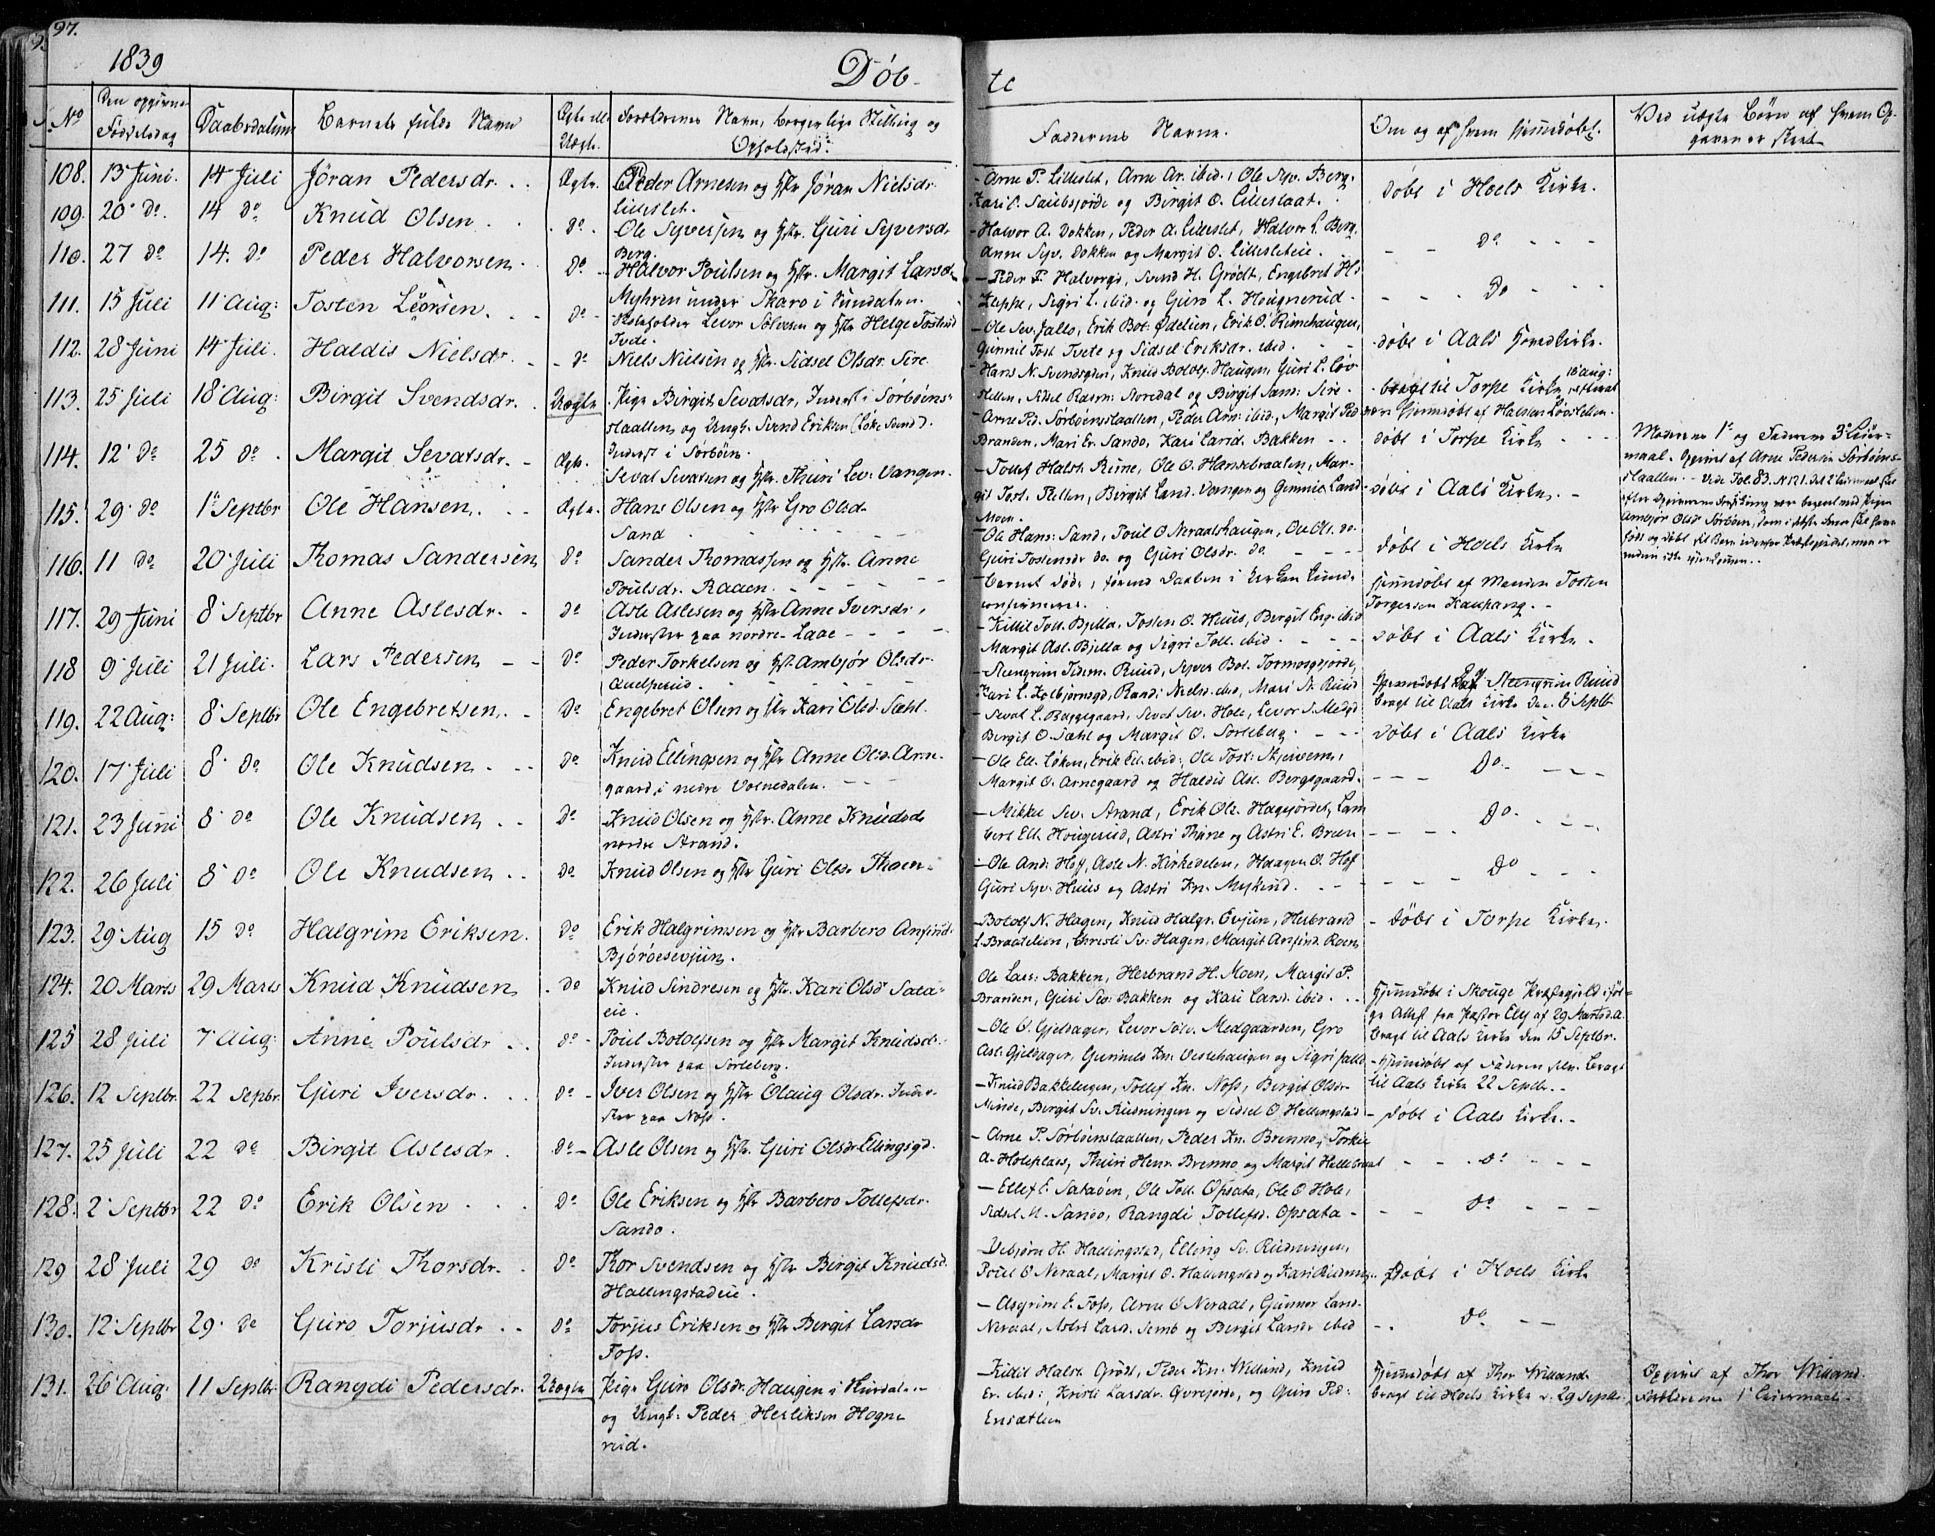 SAKO, Ål kirkebøker, F/Fa/L0005: Ministerialbok nr. I 5, 1825-1848, s. 97